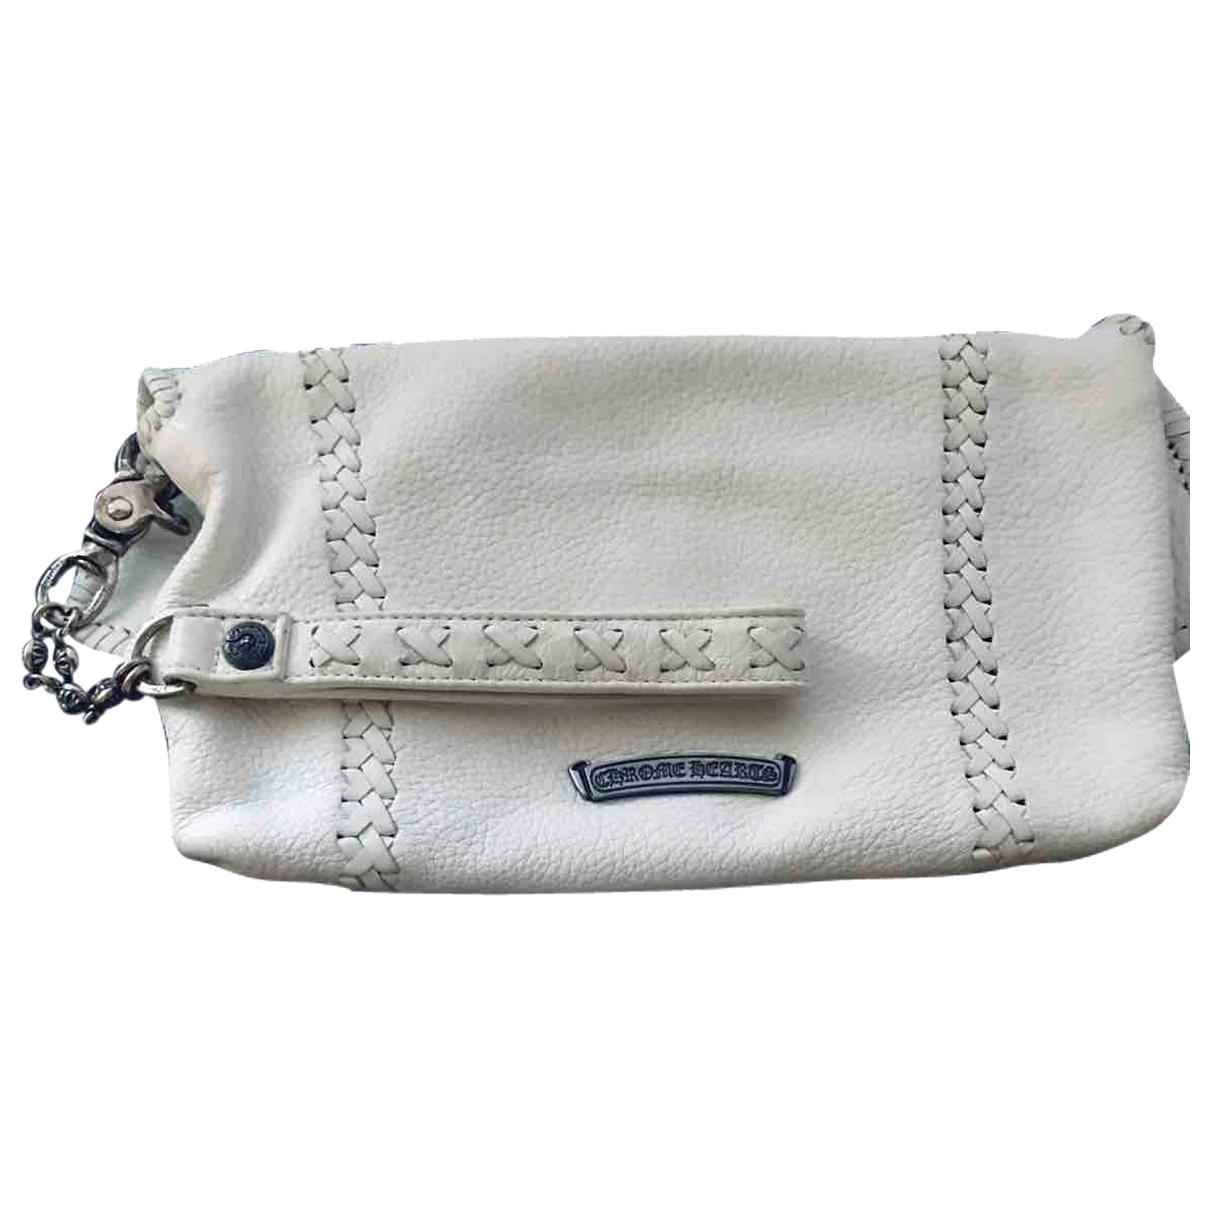 Chrome Hearts N White Leather Clutch bag for Women N